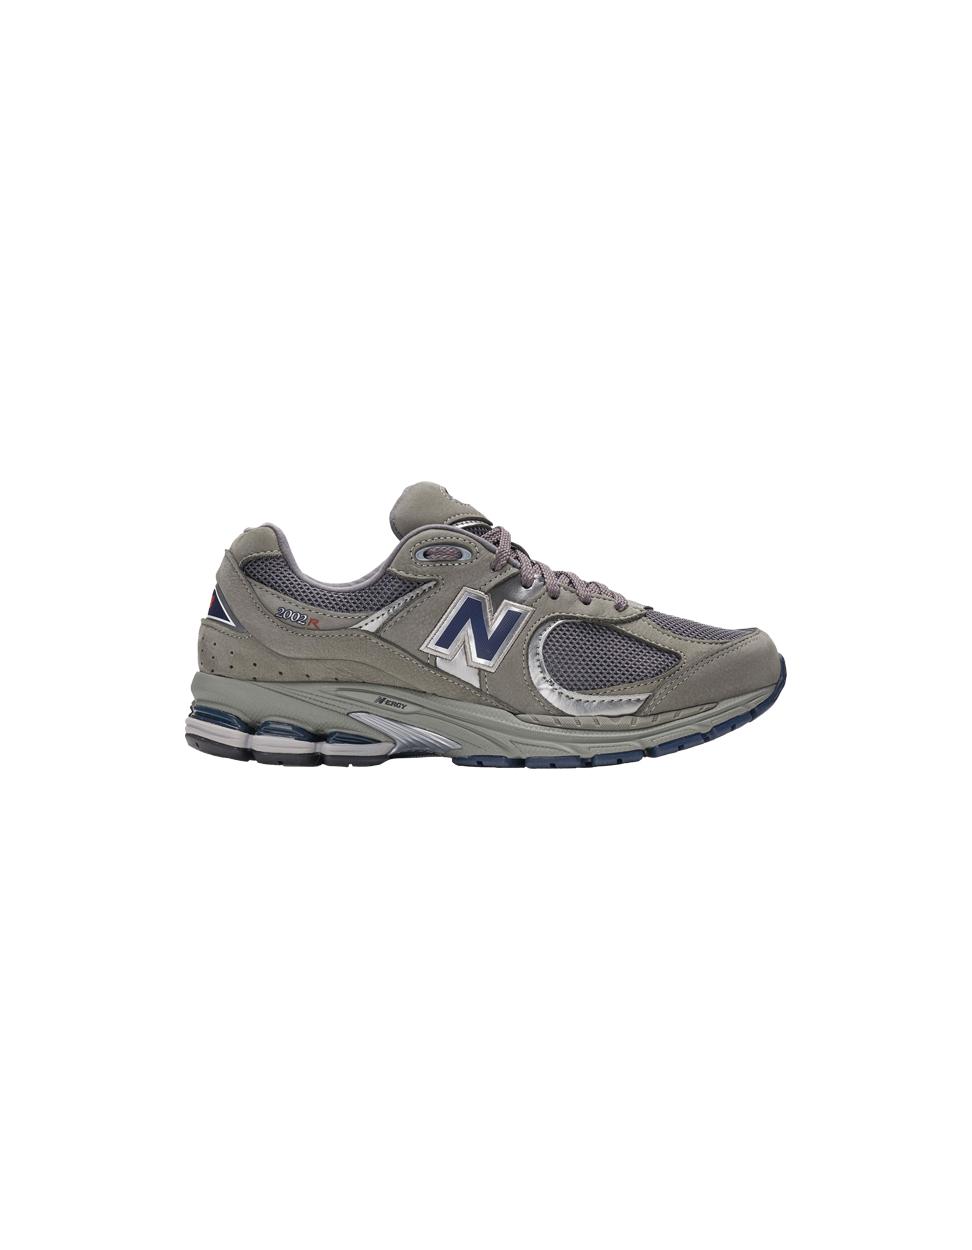 New Balance ML2002RA Castlerock / Natural indig